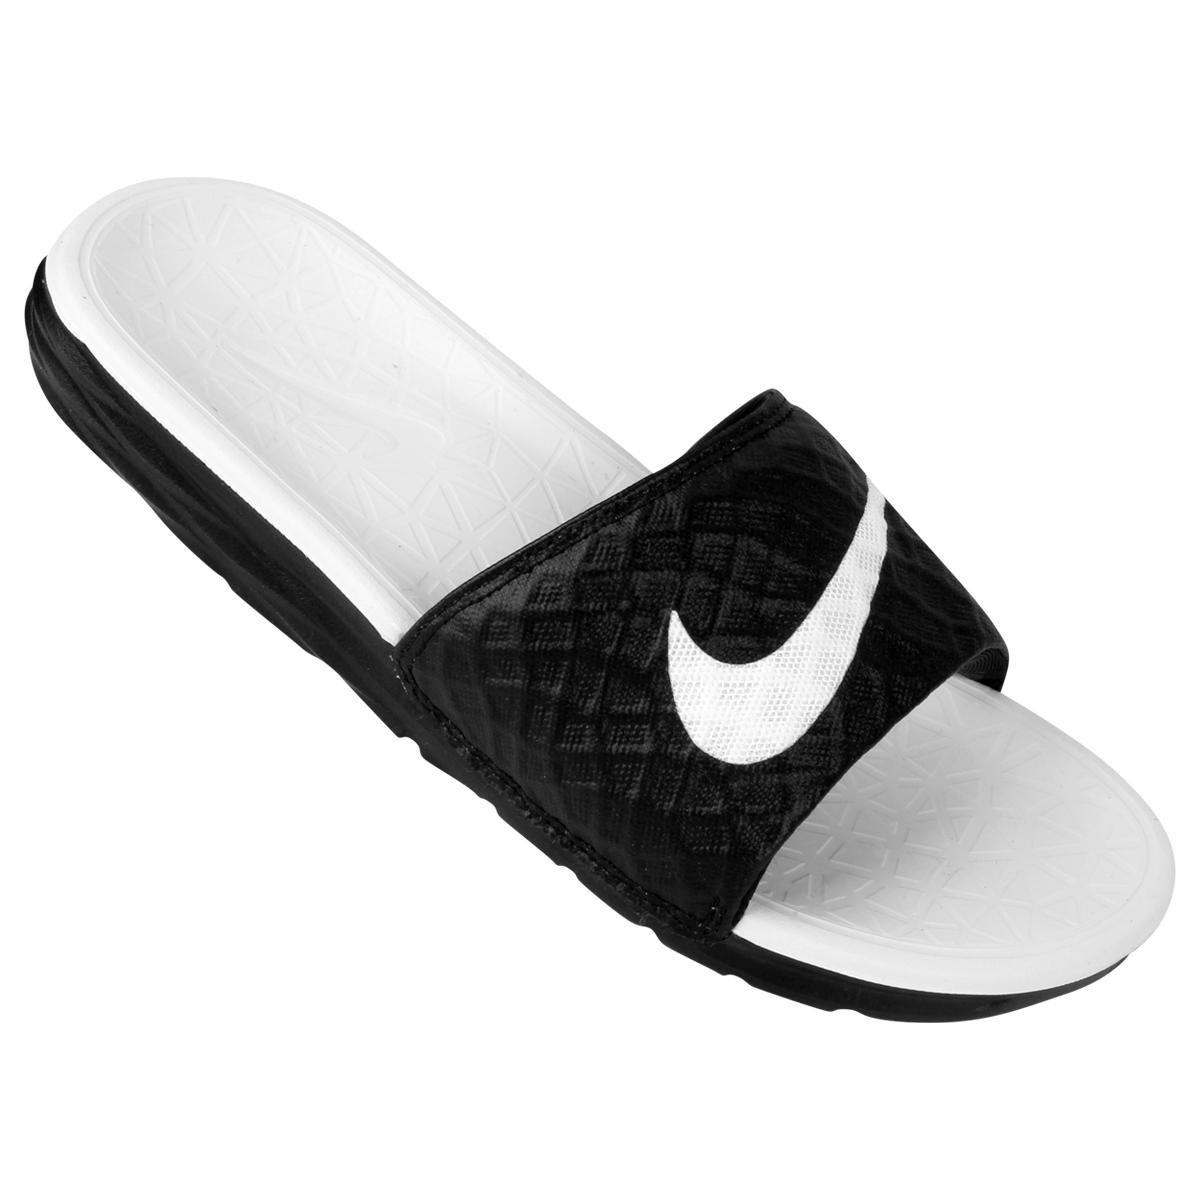 c6e56b50bae Chinelo Nike Benassi Solarsoft - Preto e Branco - Compre Agora ...